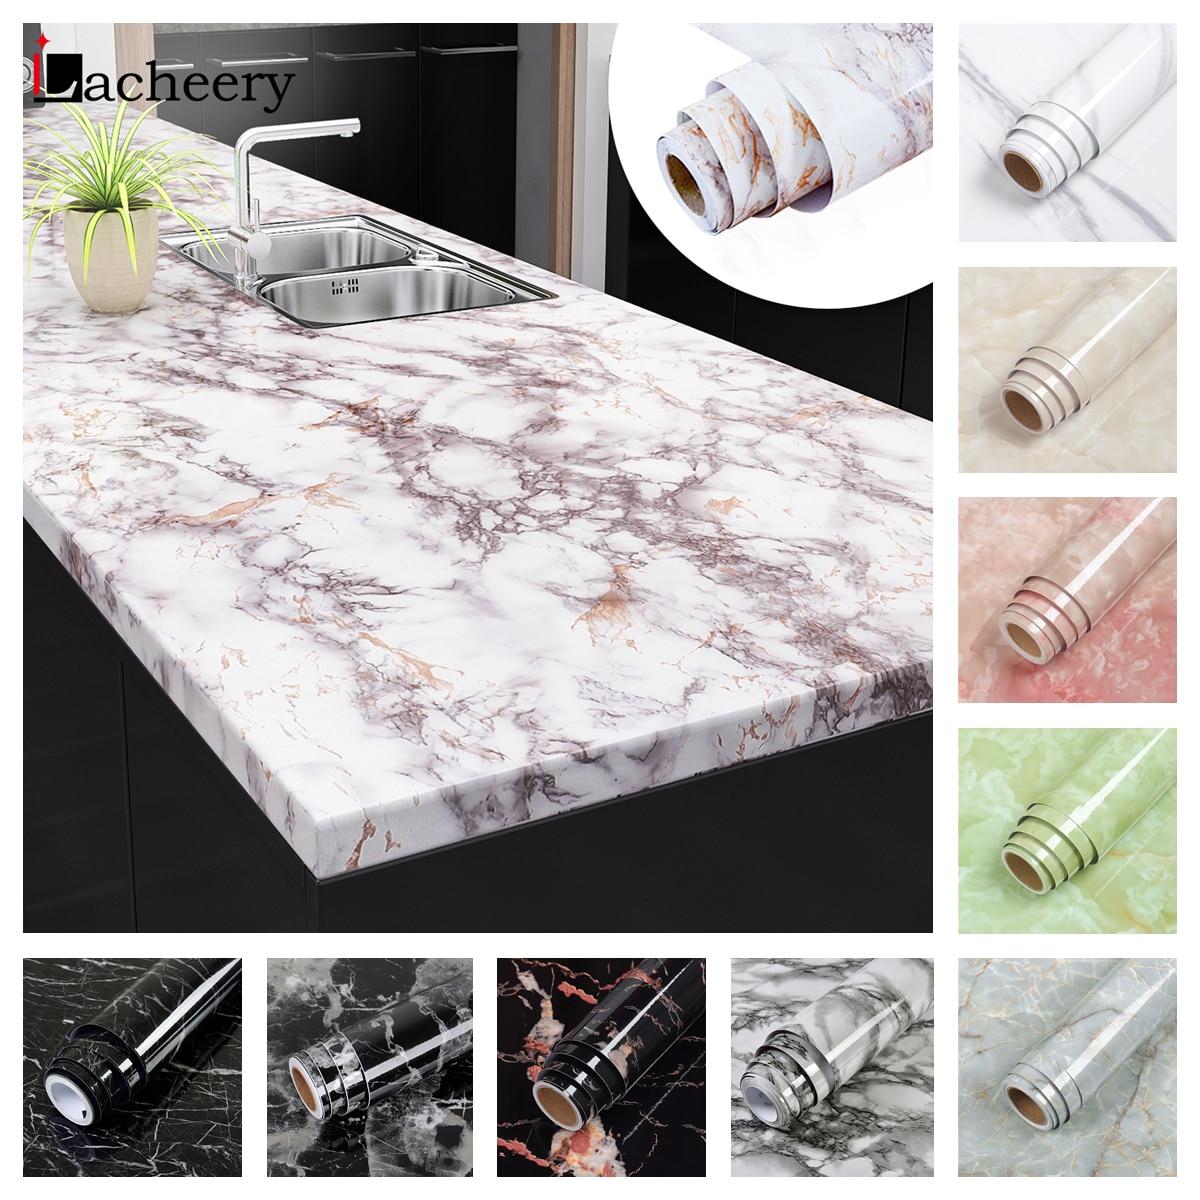 50 Colors Waterproof Oil-proof Marble Self Adhesive Wallpaper Vinyl Film Wall Stickers Bathroom Kitchen Cupboard Home Decoration